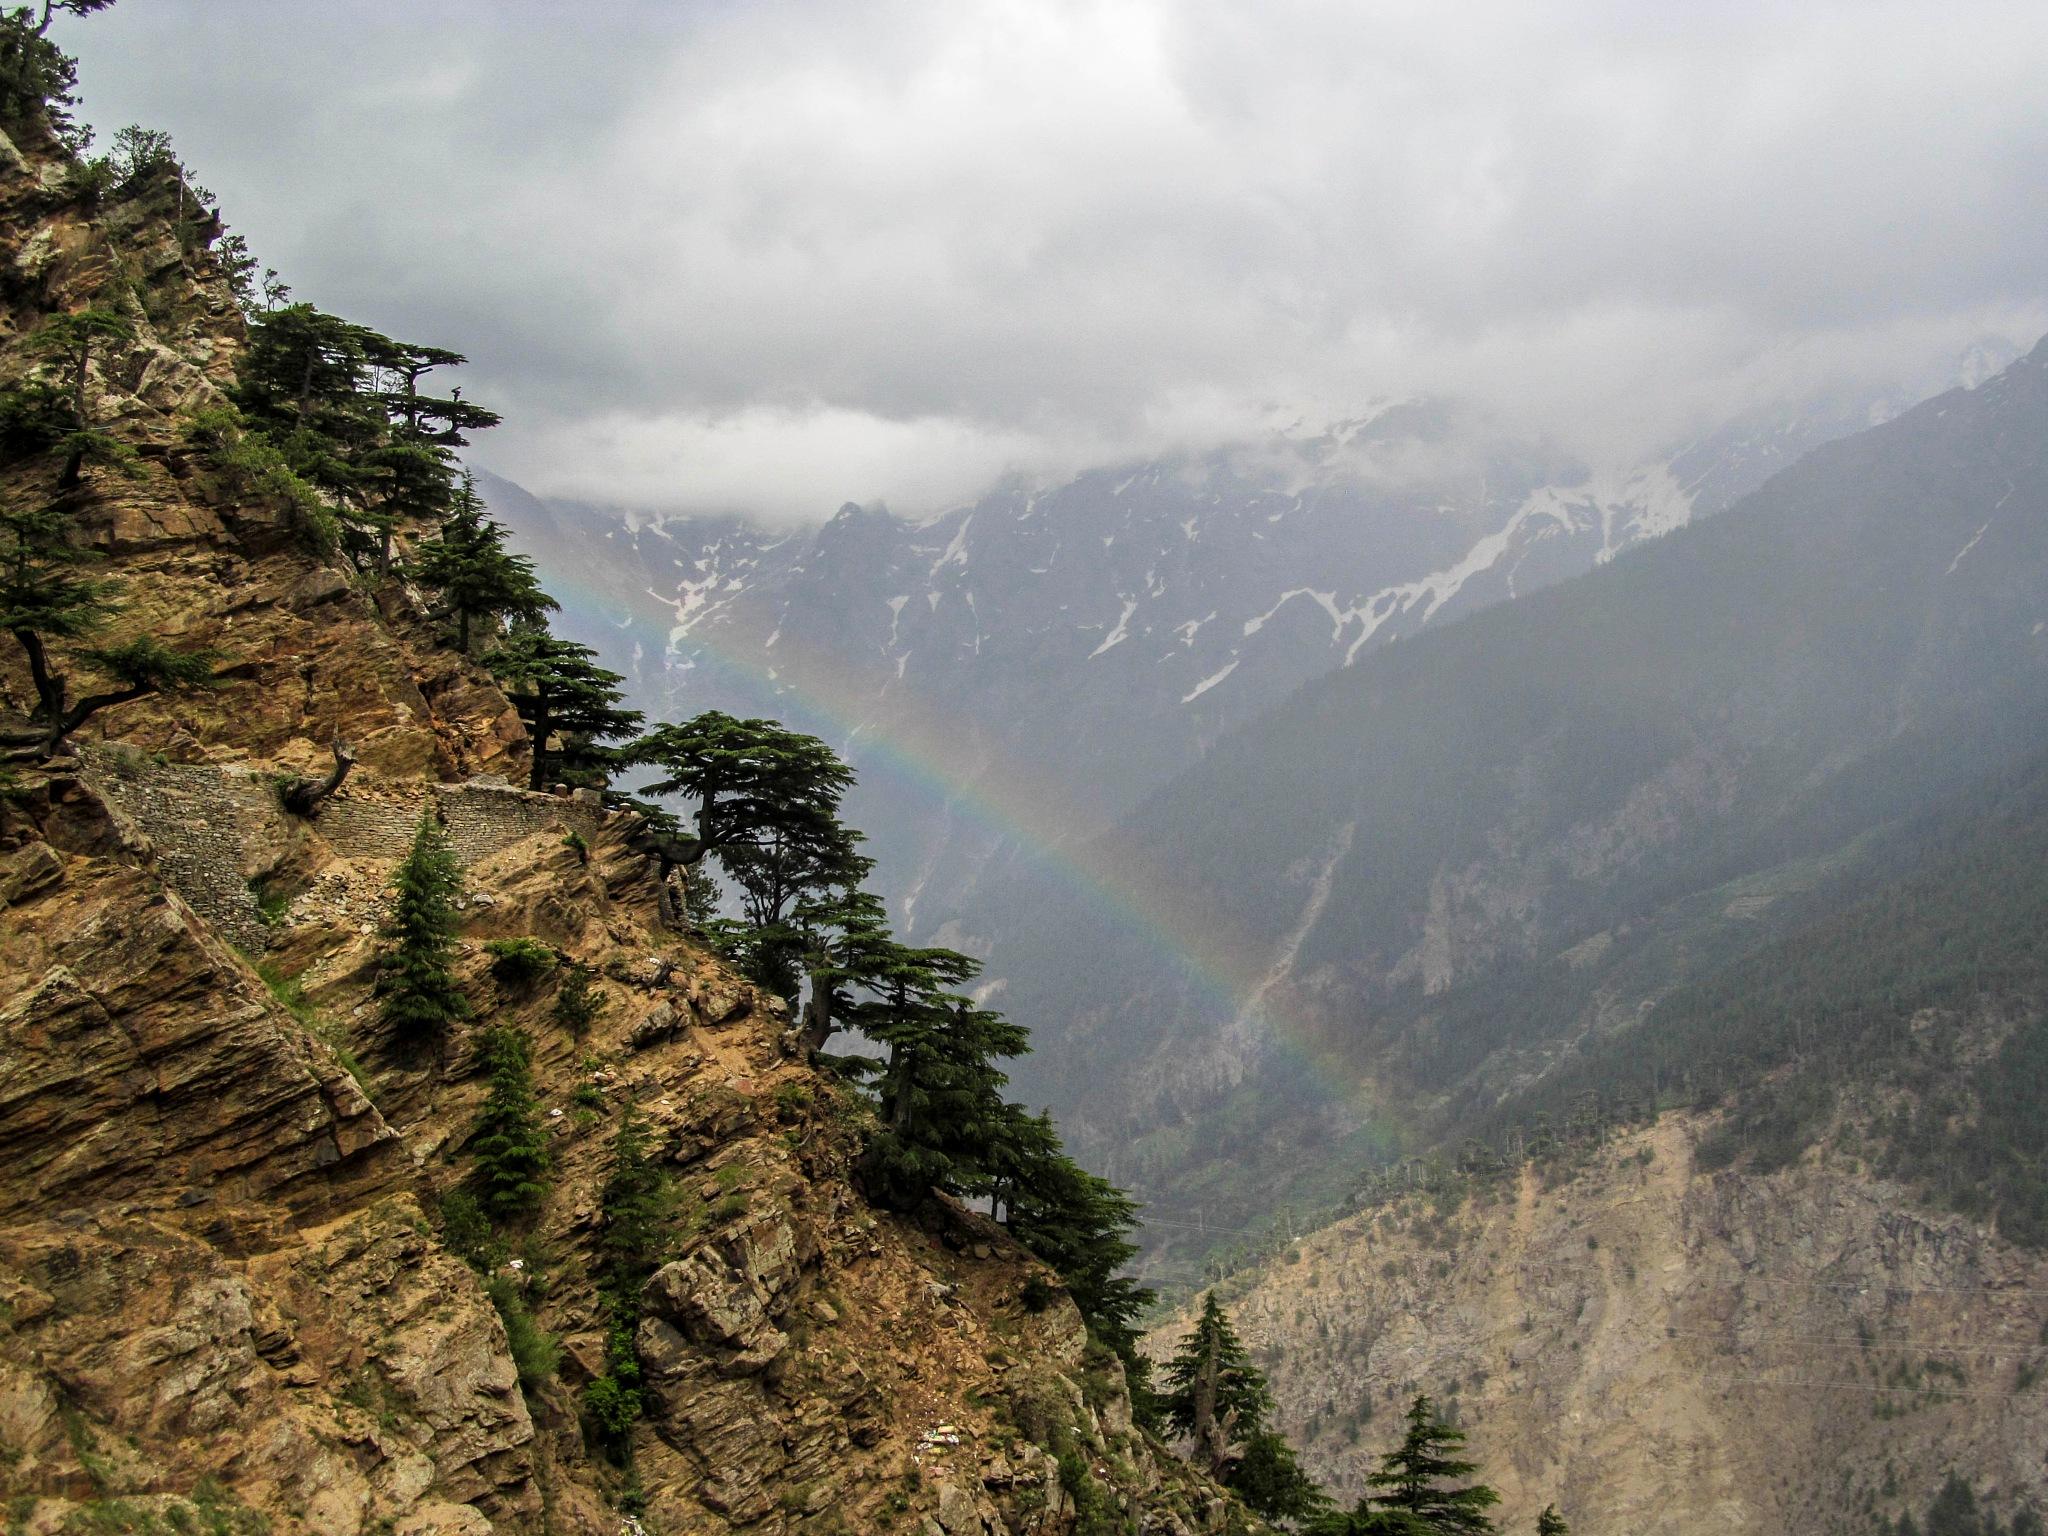 Cloudy Rainbow by Anubhav Chauhan